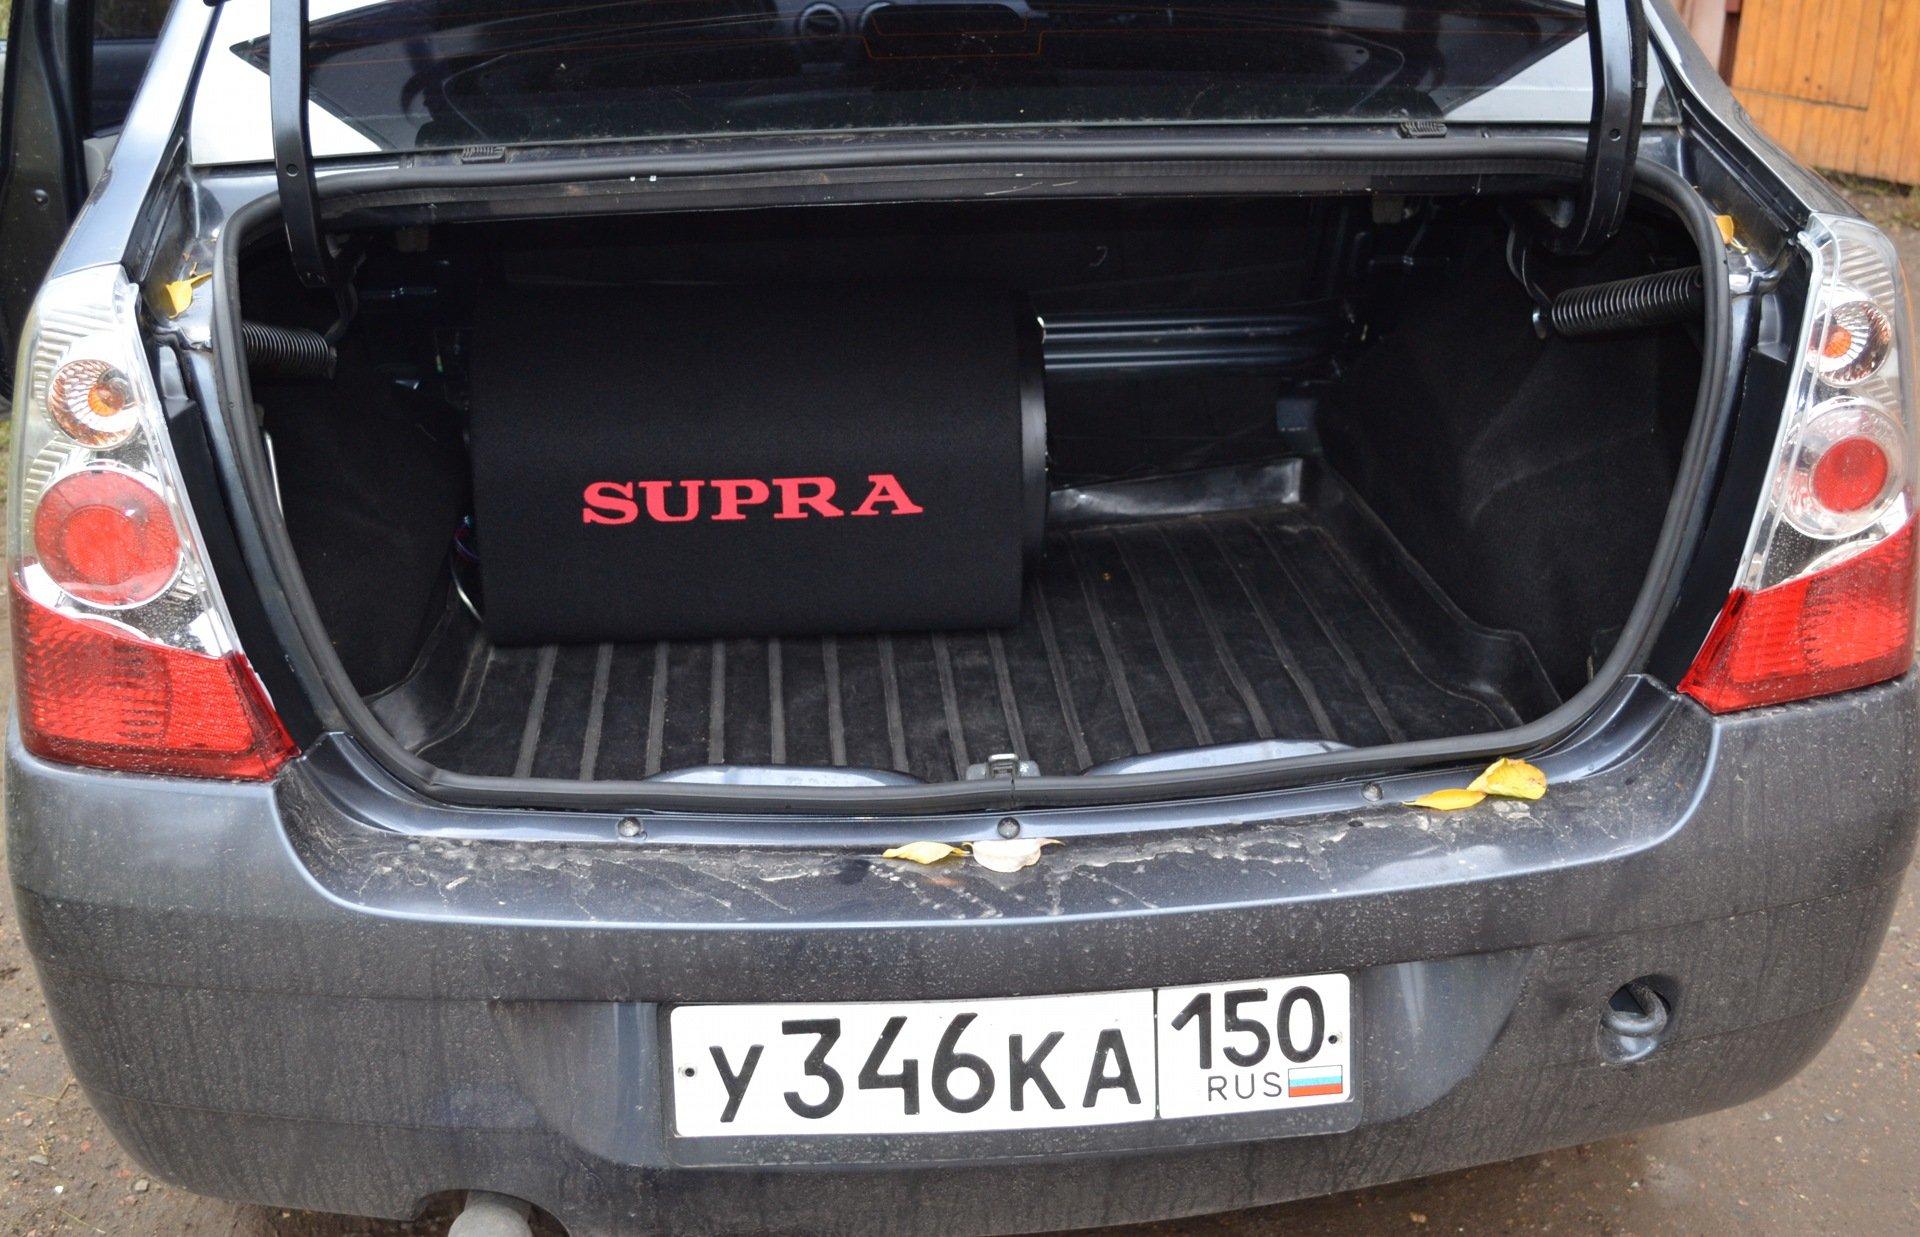 Supra srd t25a схема подключения